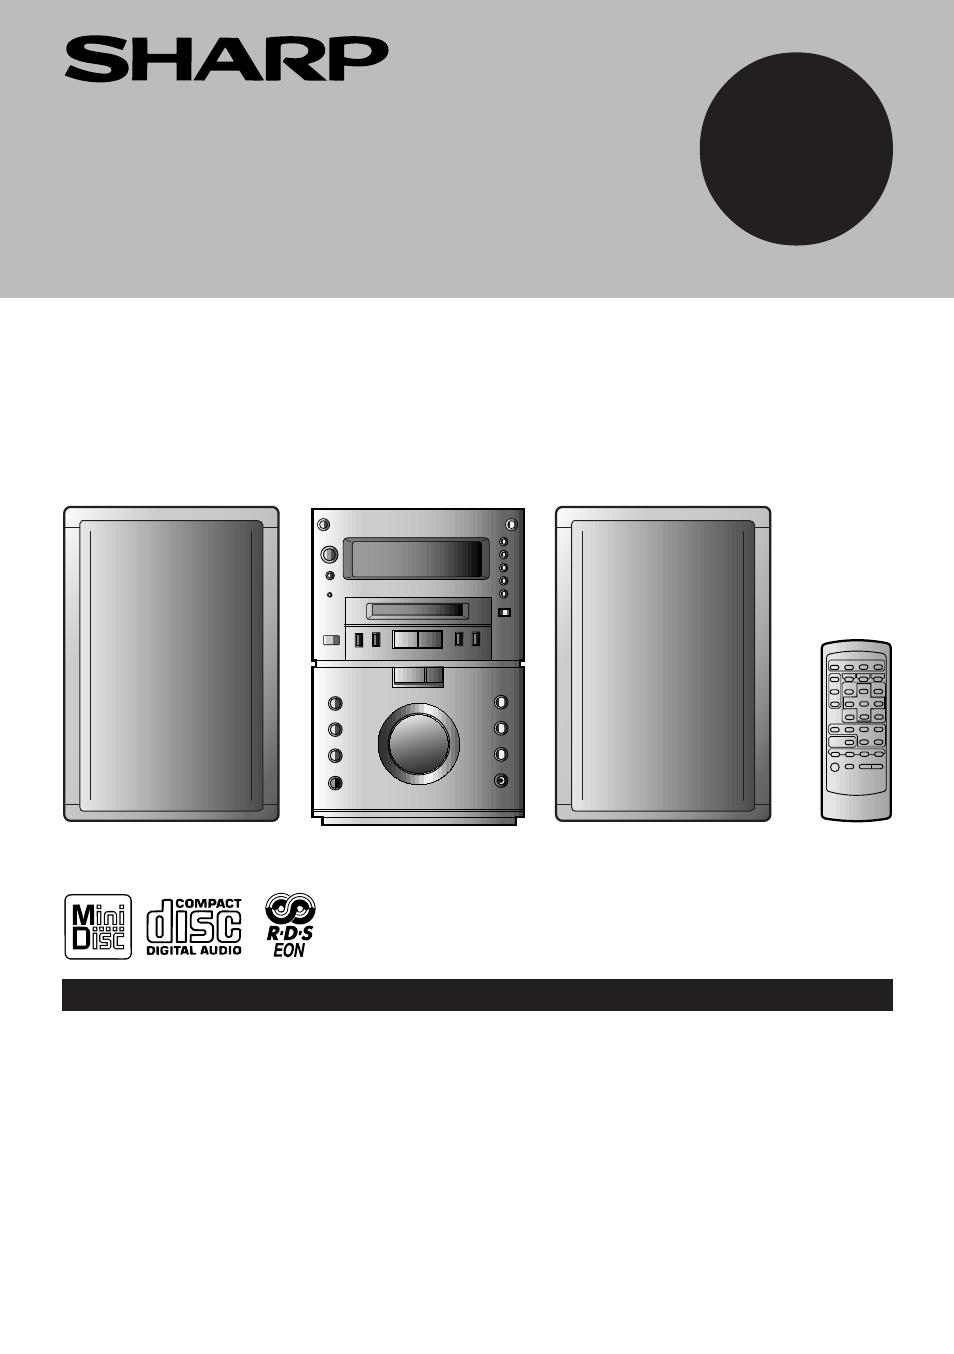 sharp md m3h user manual 52 pages rh manualsdir com sharp audio system manual xl-dk255 Sharp 5-Disc Stereo System